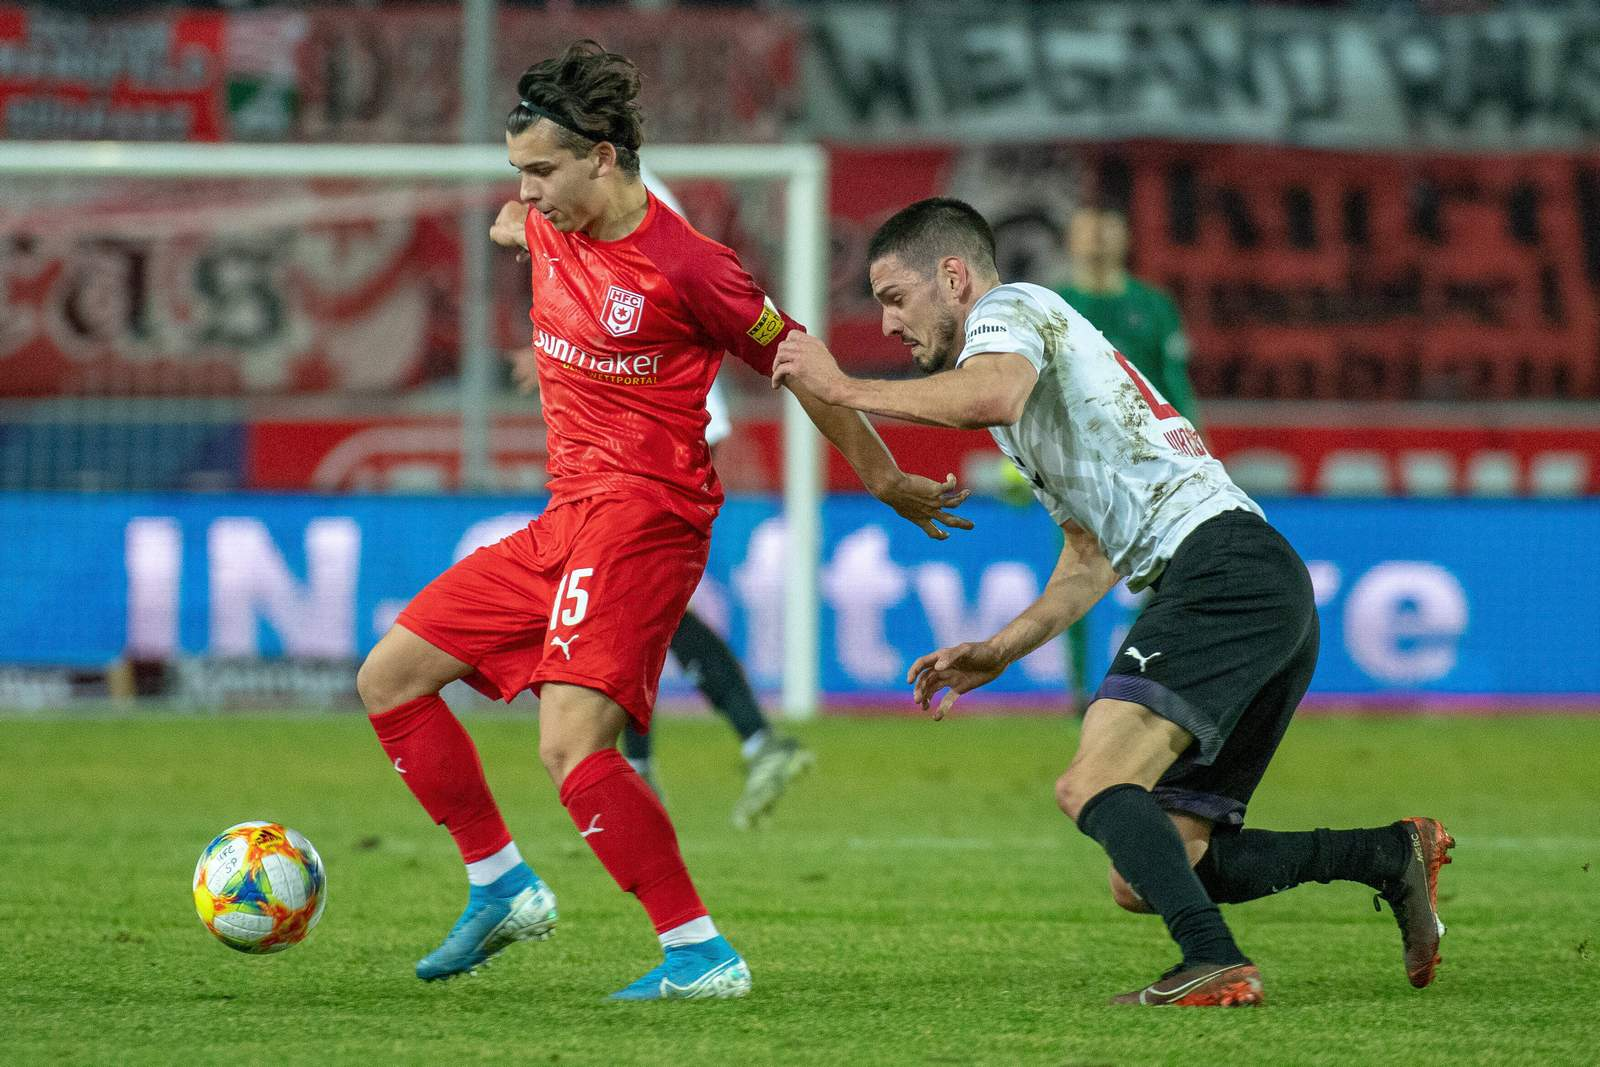 Jan Shcherbakovski im Spiel HFC vs Viktoria Köln